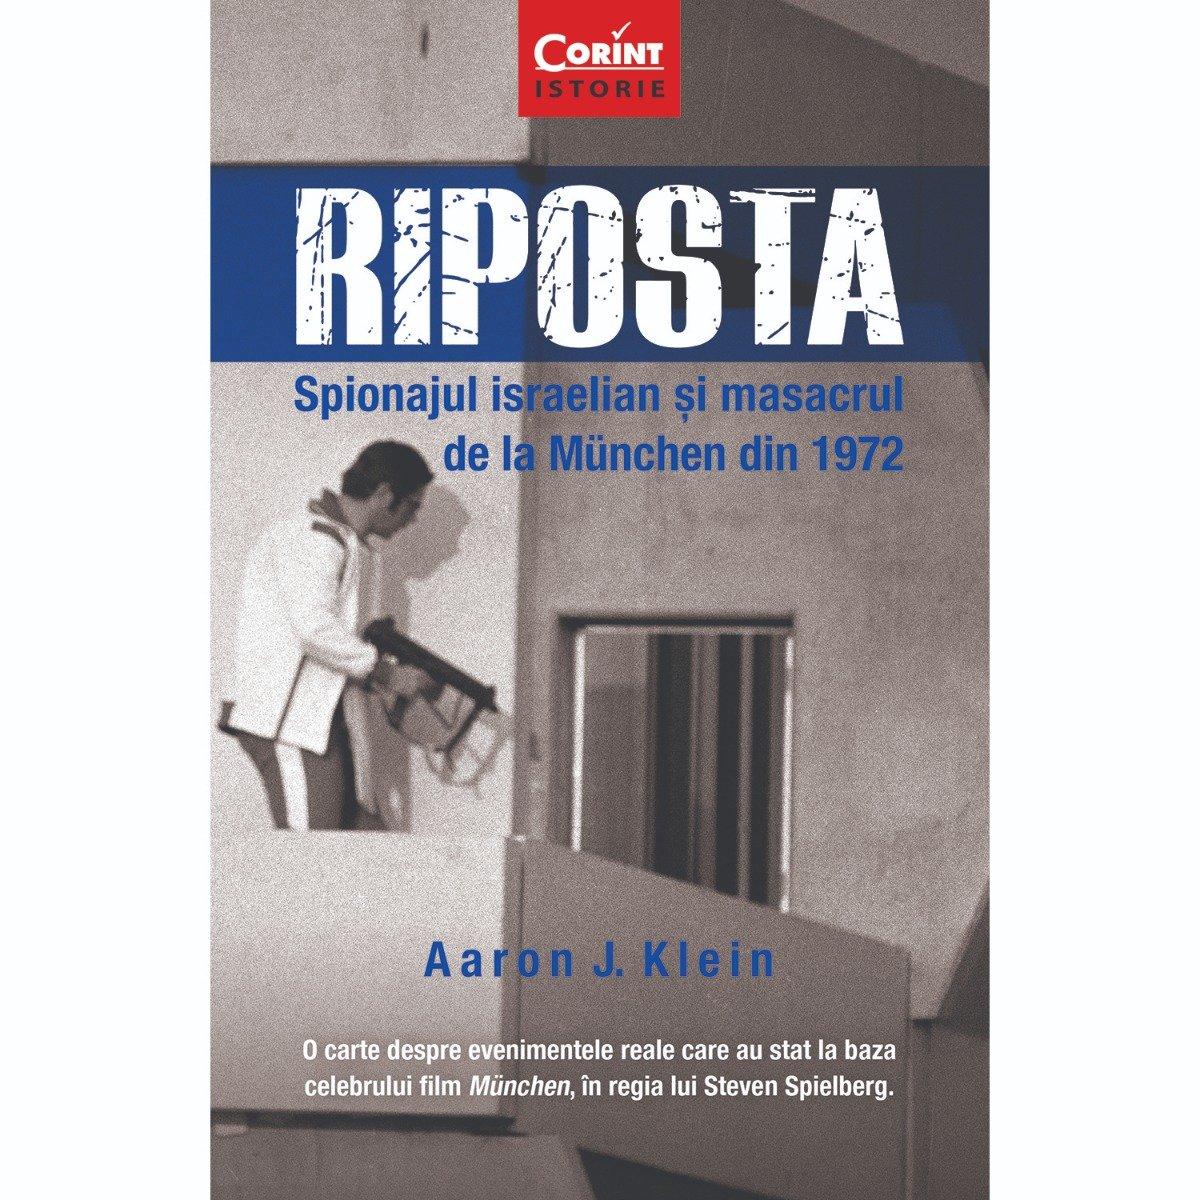 Carte Editura Corint, Riposta. Spionajul Israelian si masacrul de la Munchen din 1972, Aaron J. Klein imagine